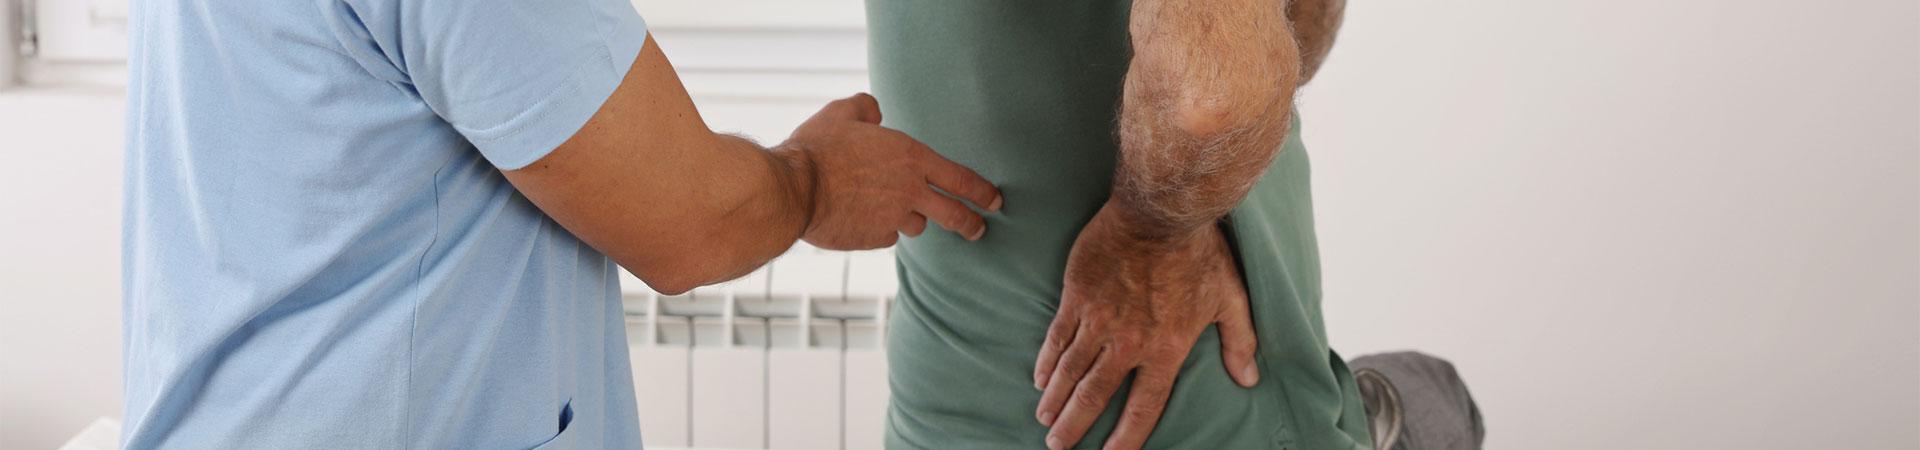 Spinal Stenosis, Sciatica, Radiculopathy